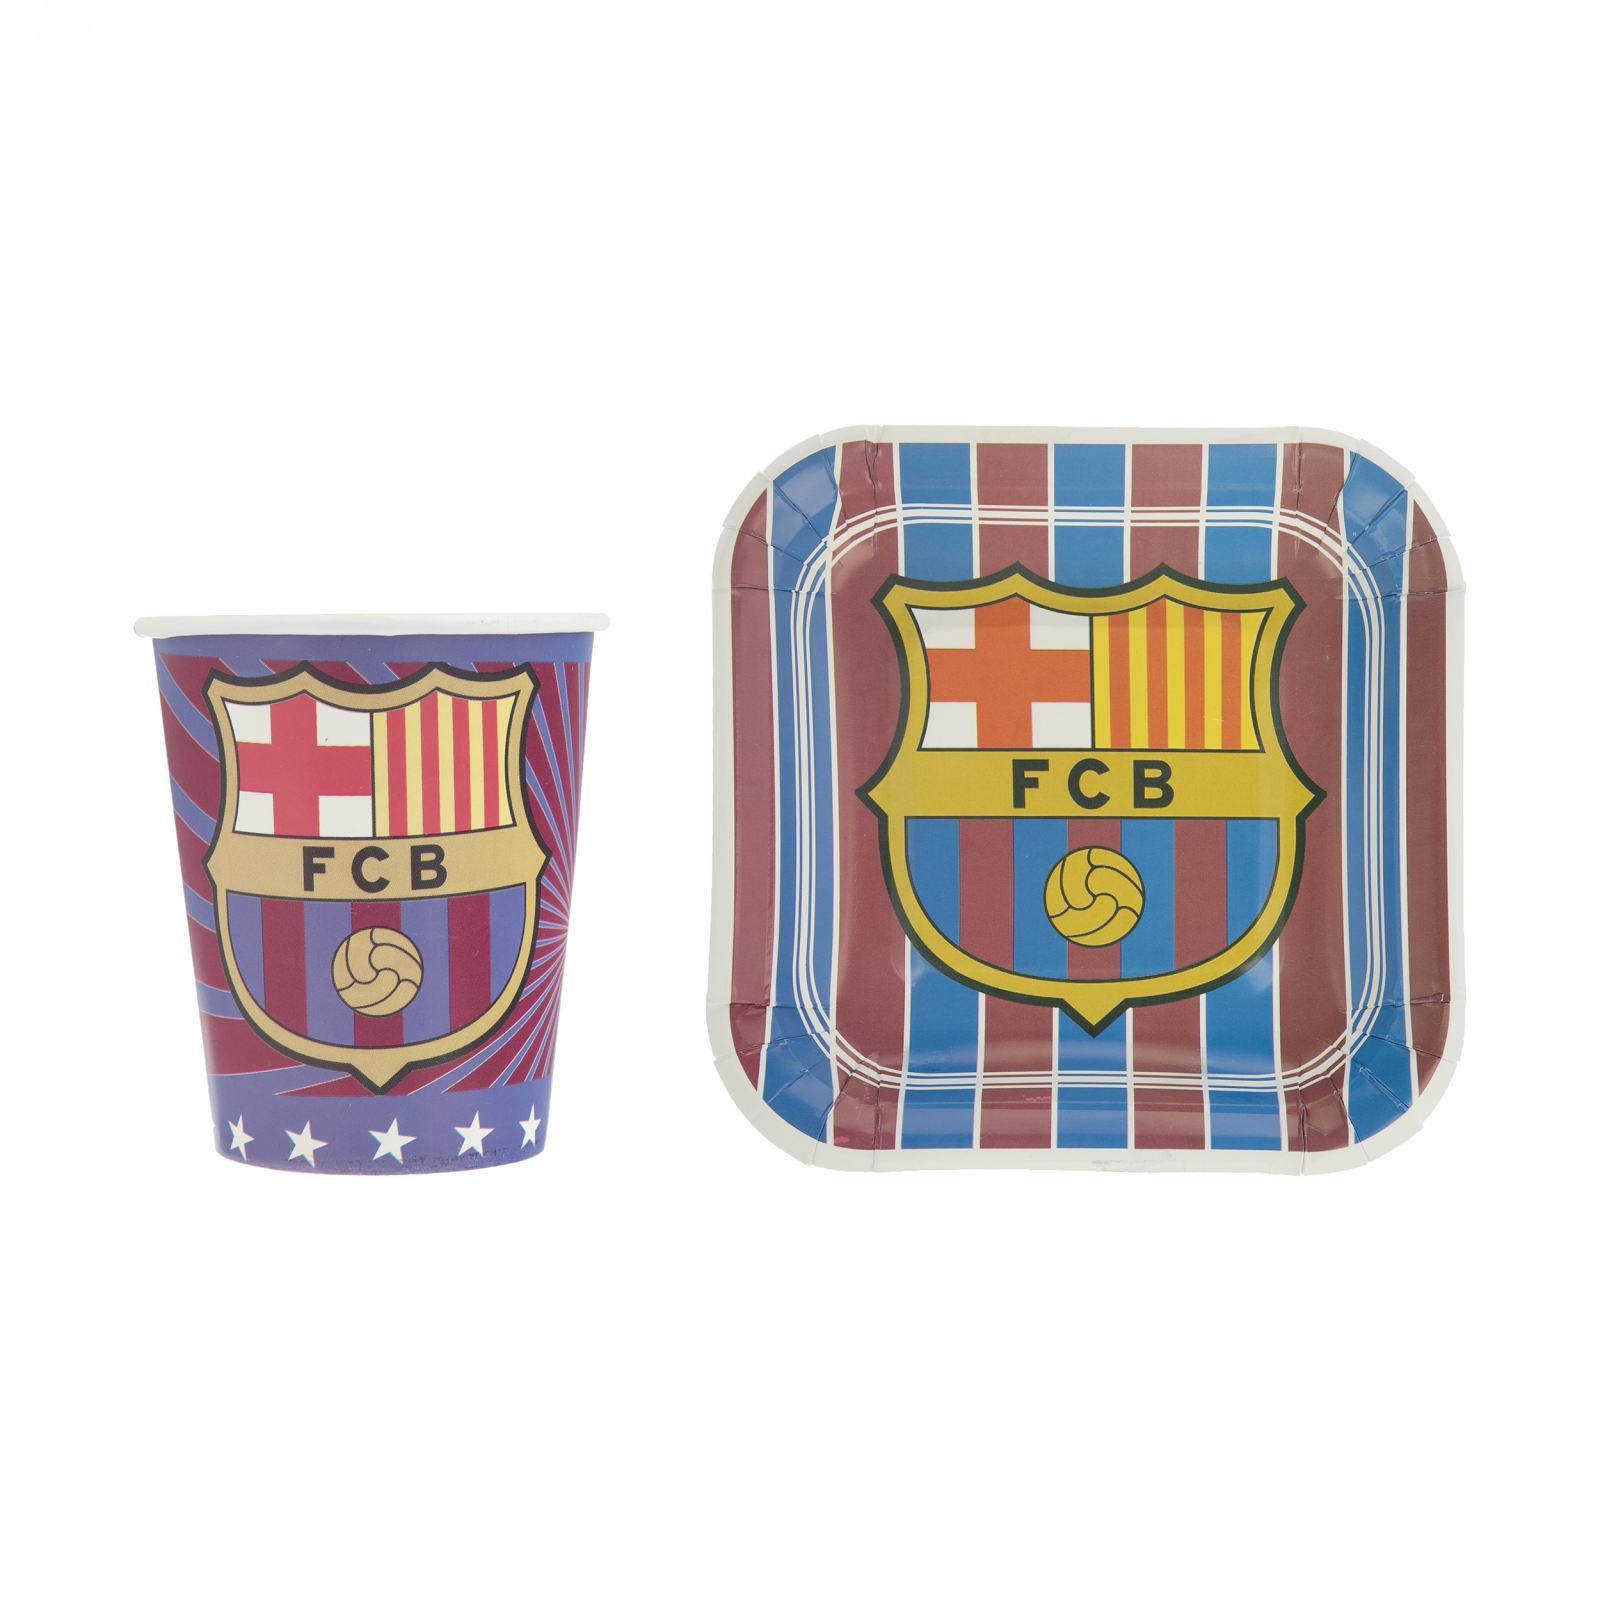 بشقاب و لیوان یکبار مصرف مدل بارسلونا مجموعه 20 عددی